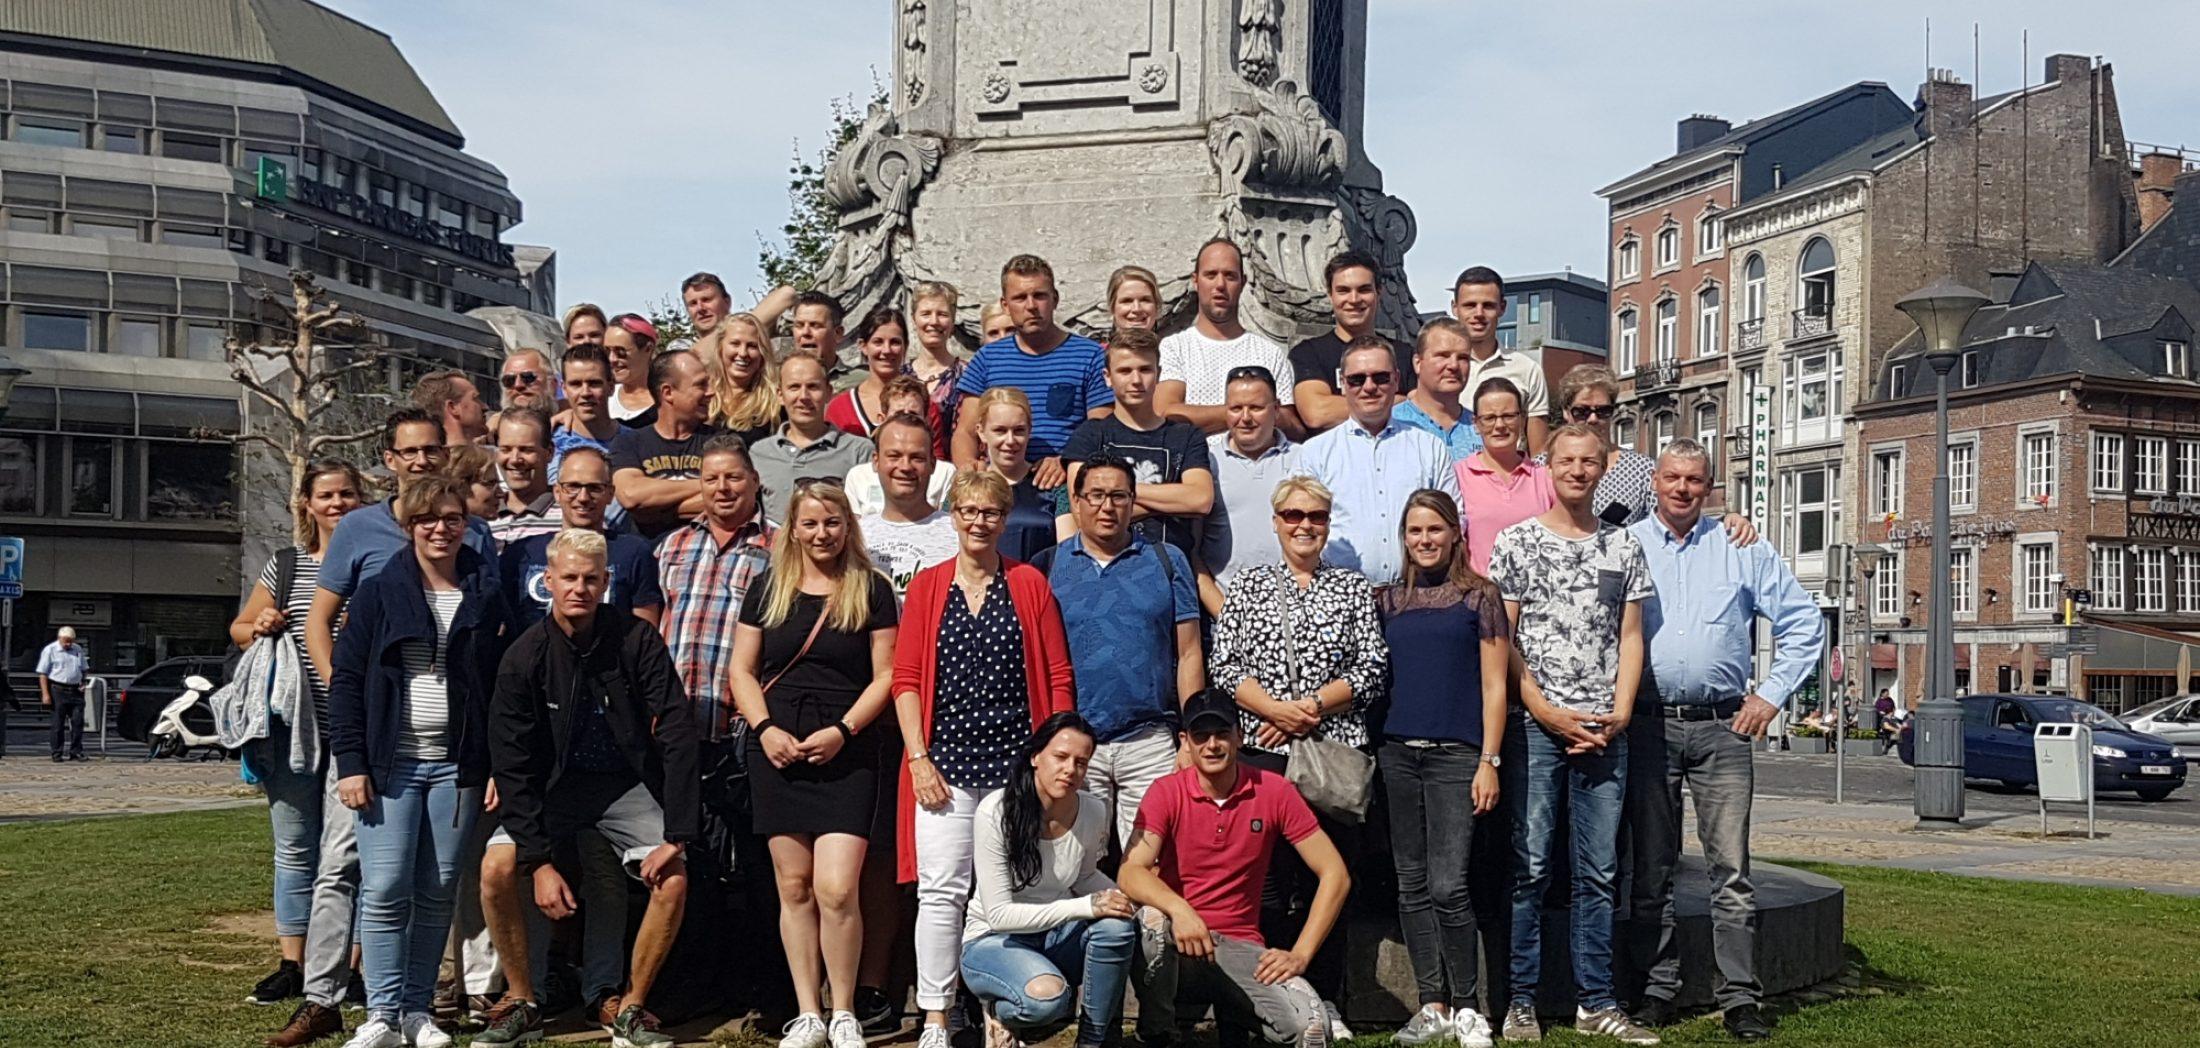 Hero image for Ardennen event 3 dagen: collega's 20/58 personen